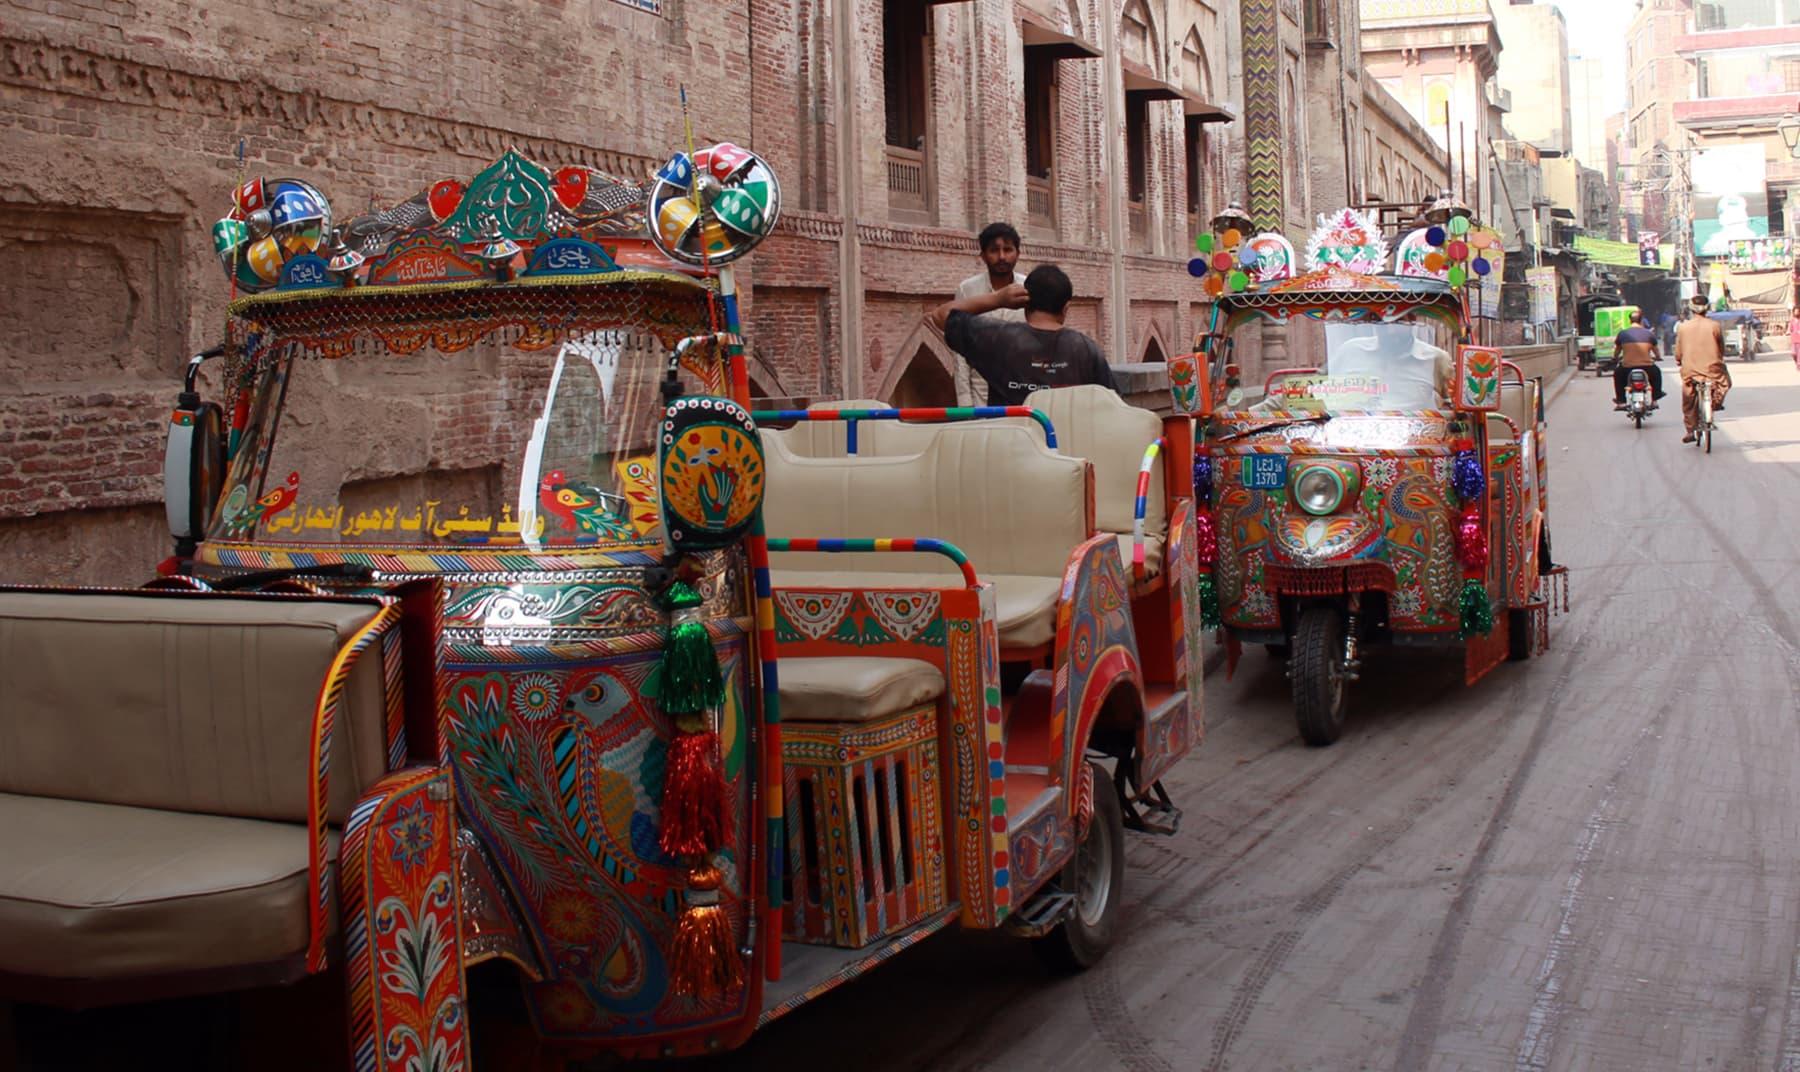 اندرون شہر لاہور —تصویر عبیداللہ کیہر